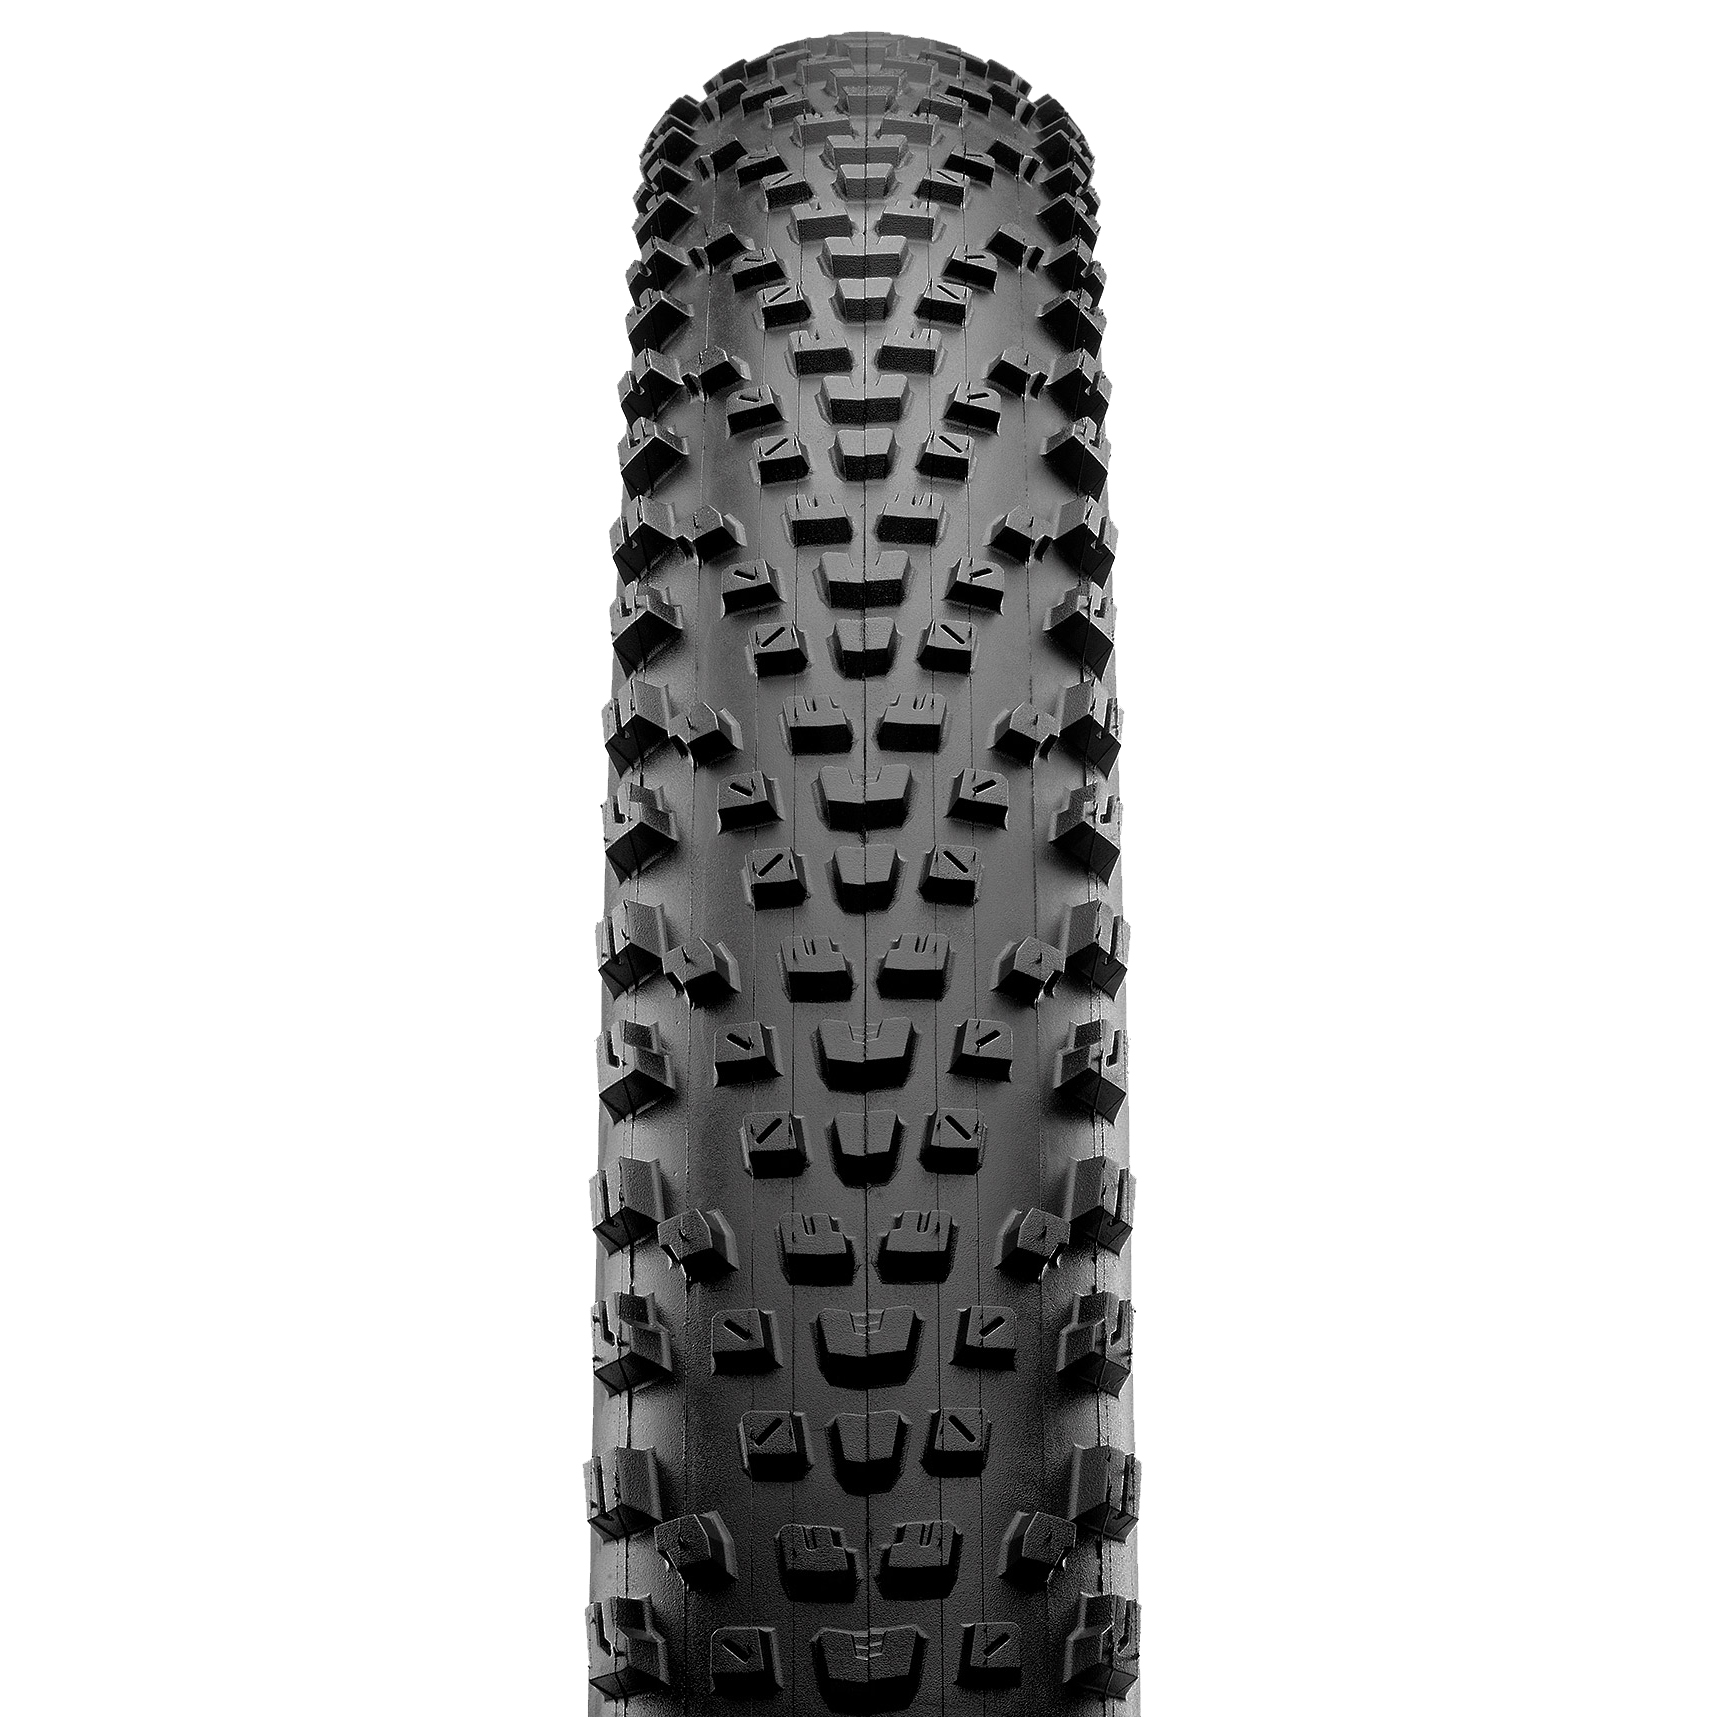 EXO Tubeless Folding Dual Compound Maxxis Rekon Race Tire: 29 x 2.25 120tpi